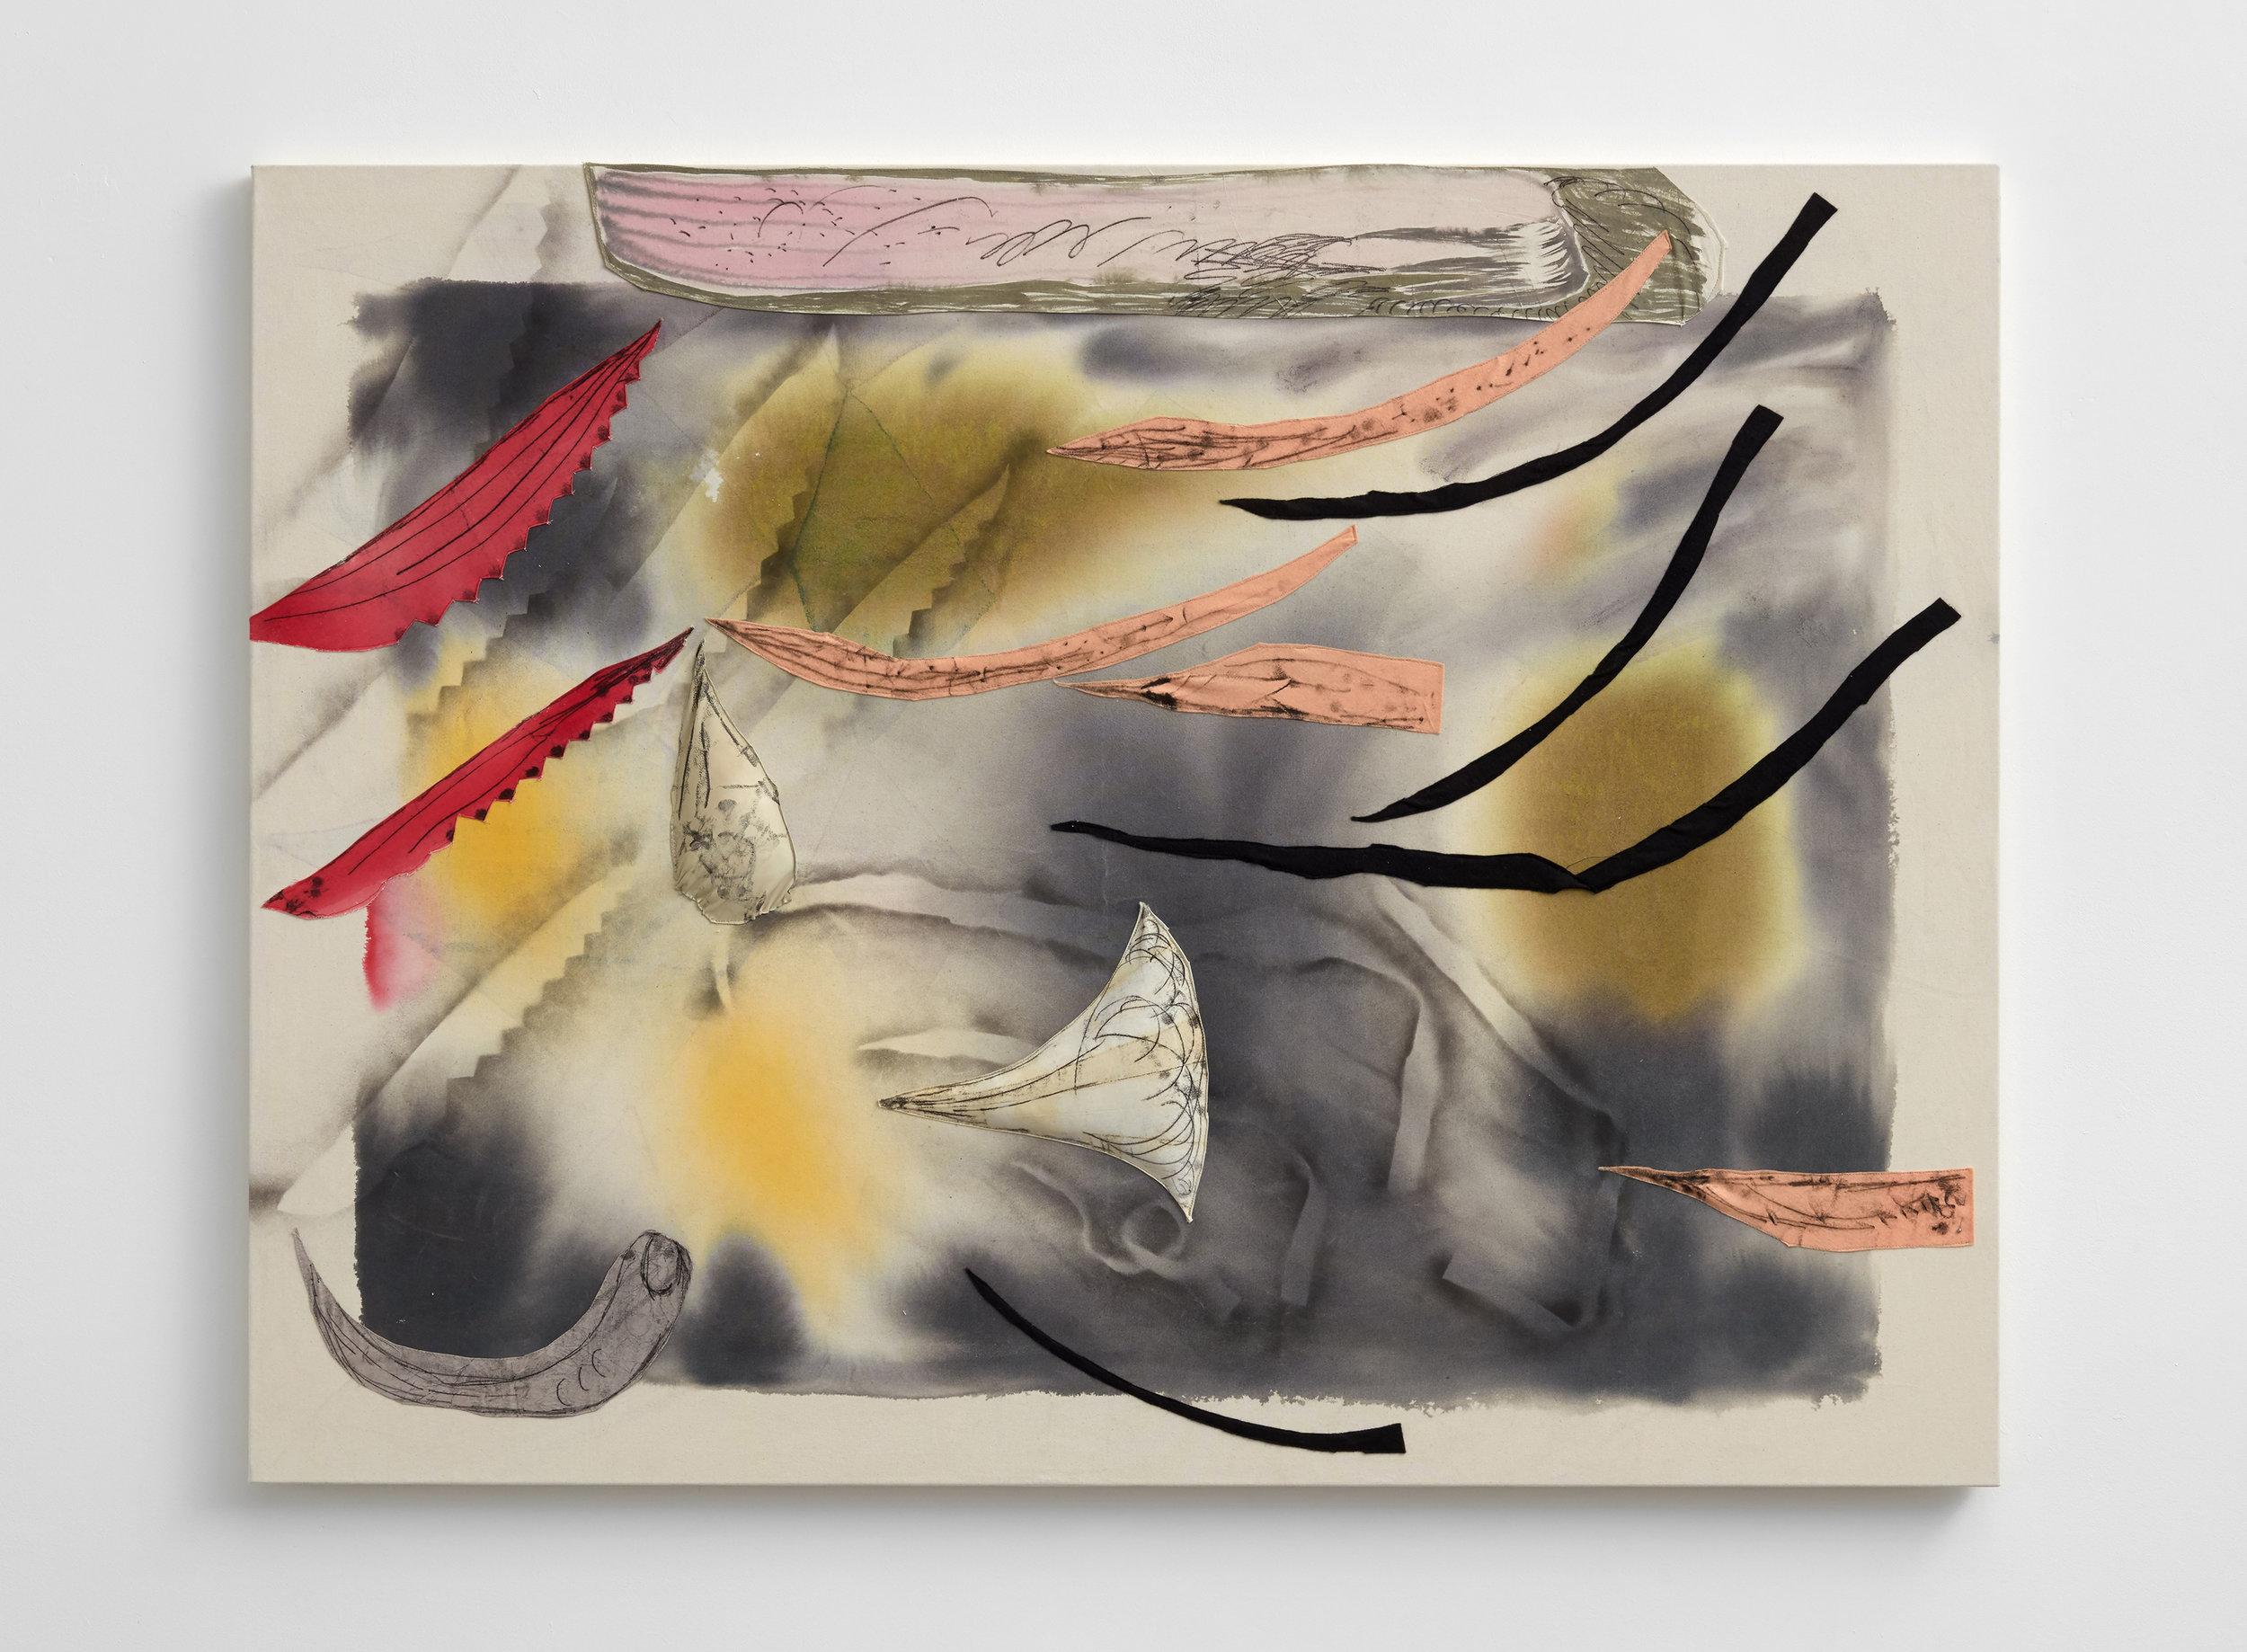 Aimée Parrott  Anthropocene view part 2, 2017  Ink, felt, velvet on canvas, 120 x 160 cm